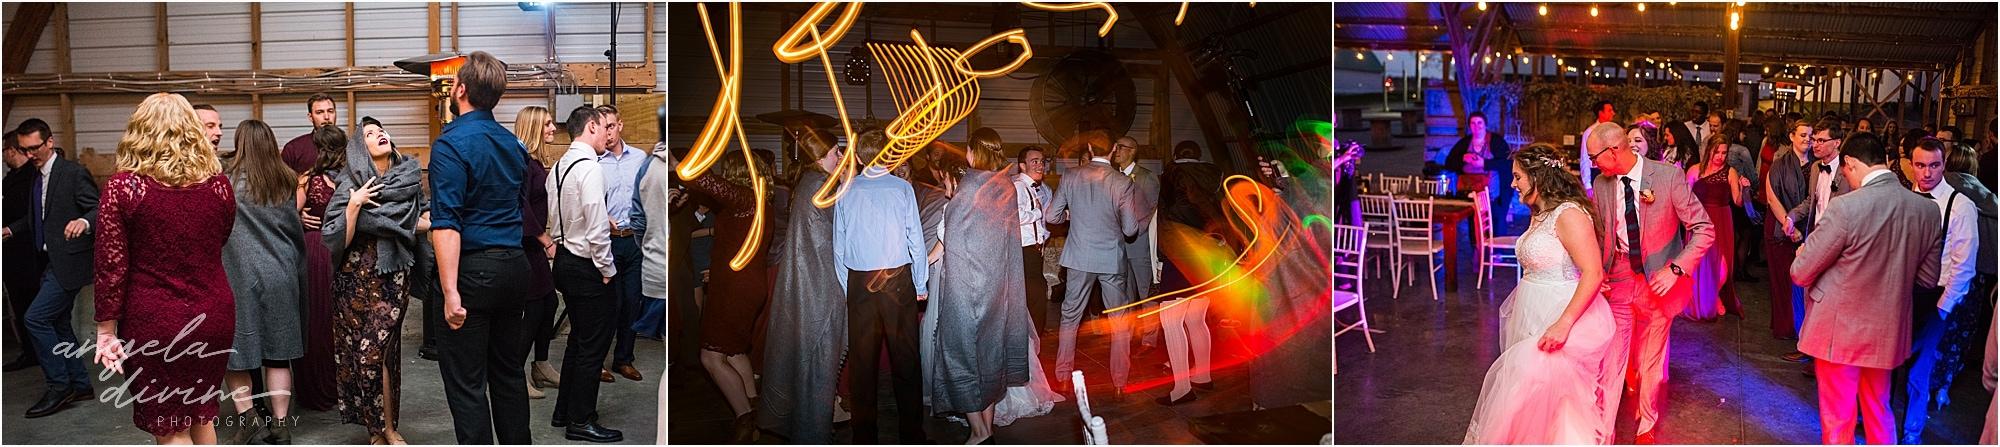 The Cottage Farmhouse Wedding Dance party